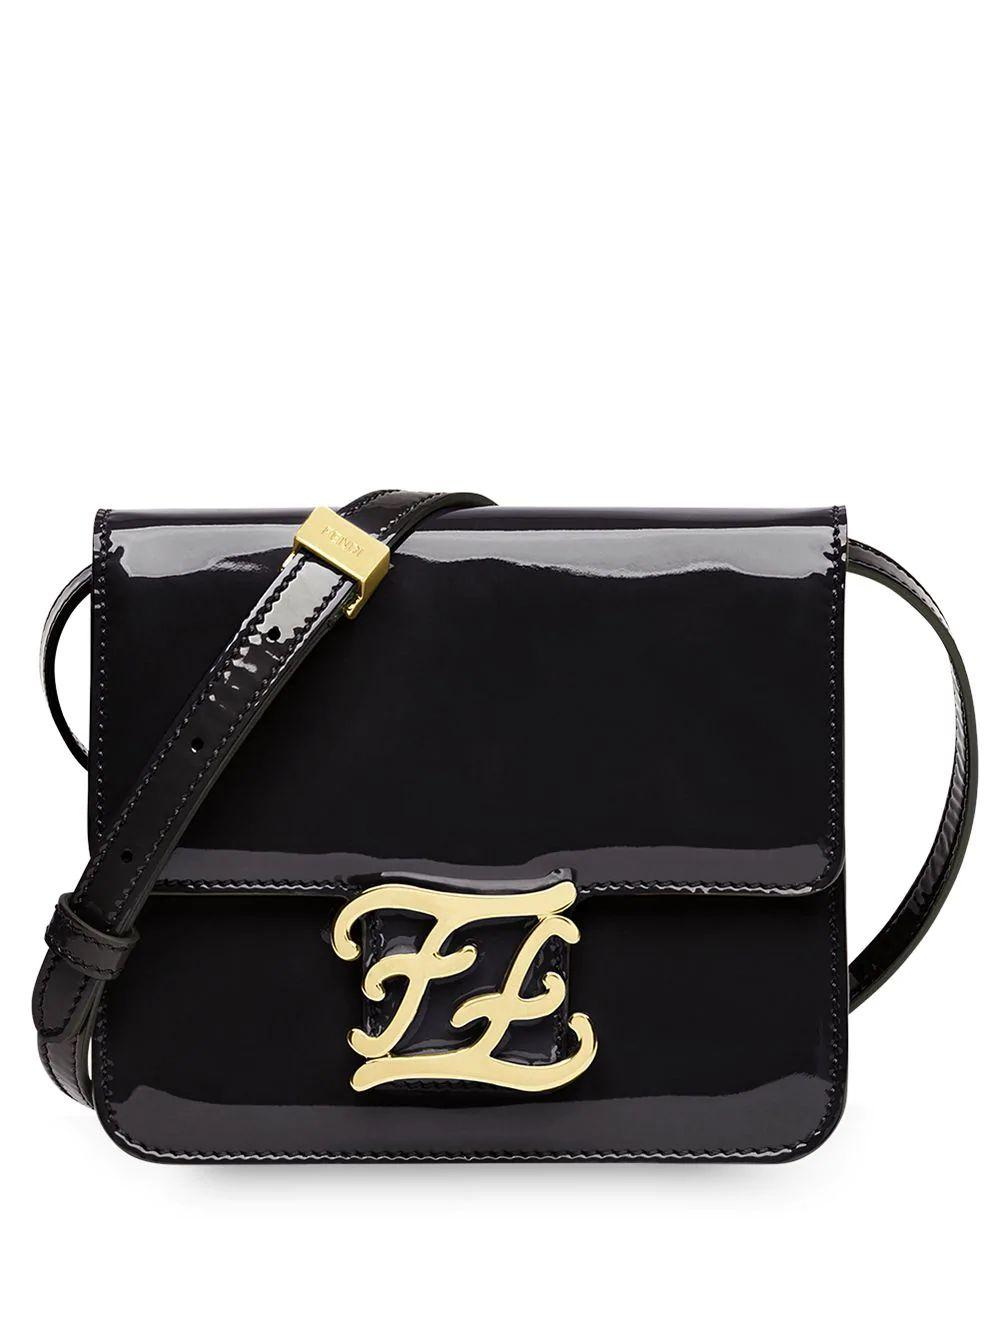 Karligraphy Flap Bag With Monogram Hardware Item # 8BT317A5AU